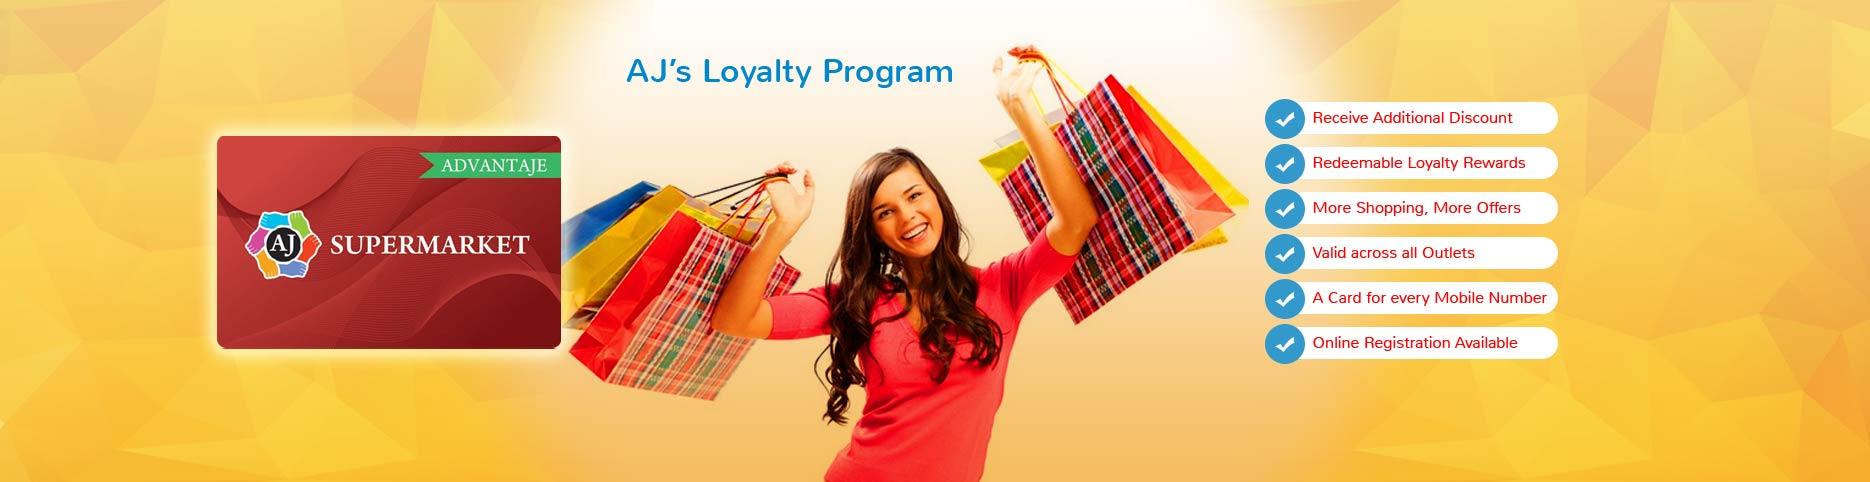 AJ's loyalty programs